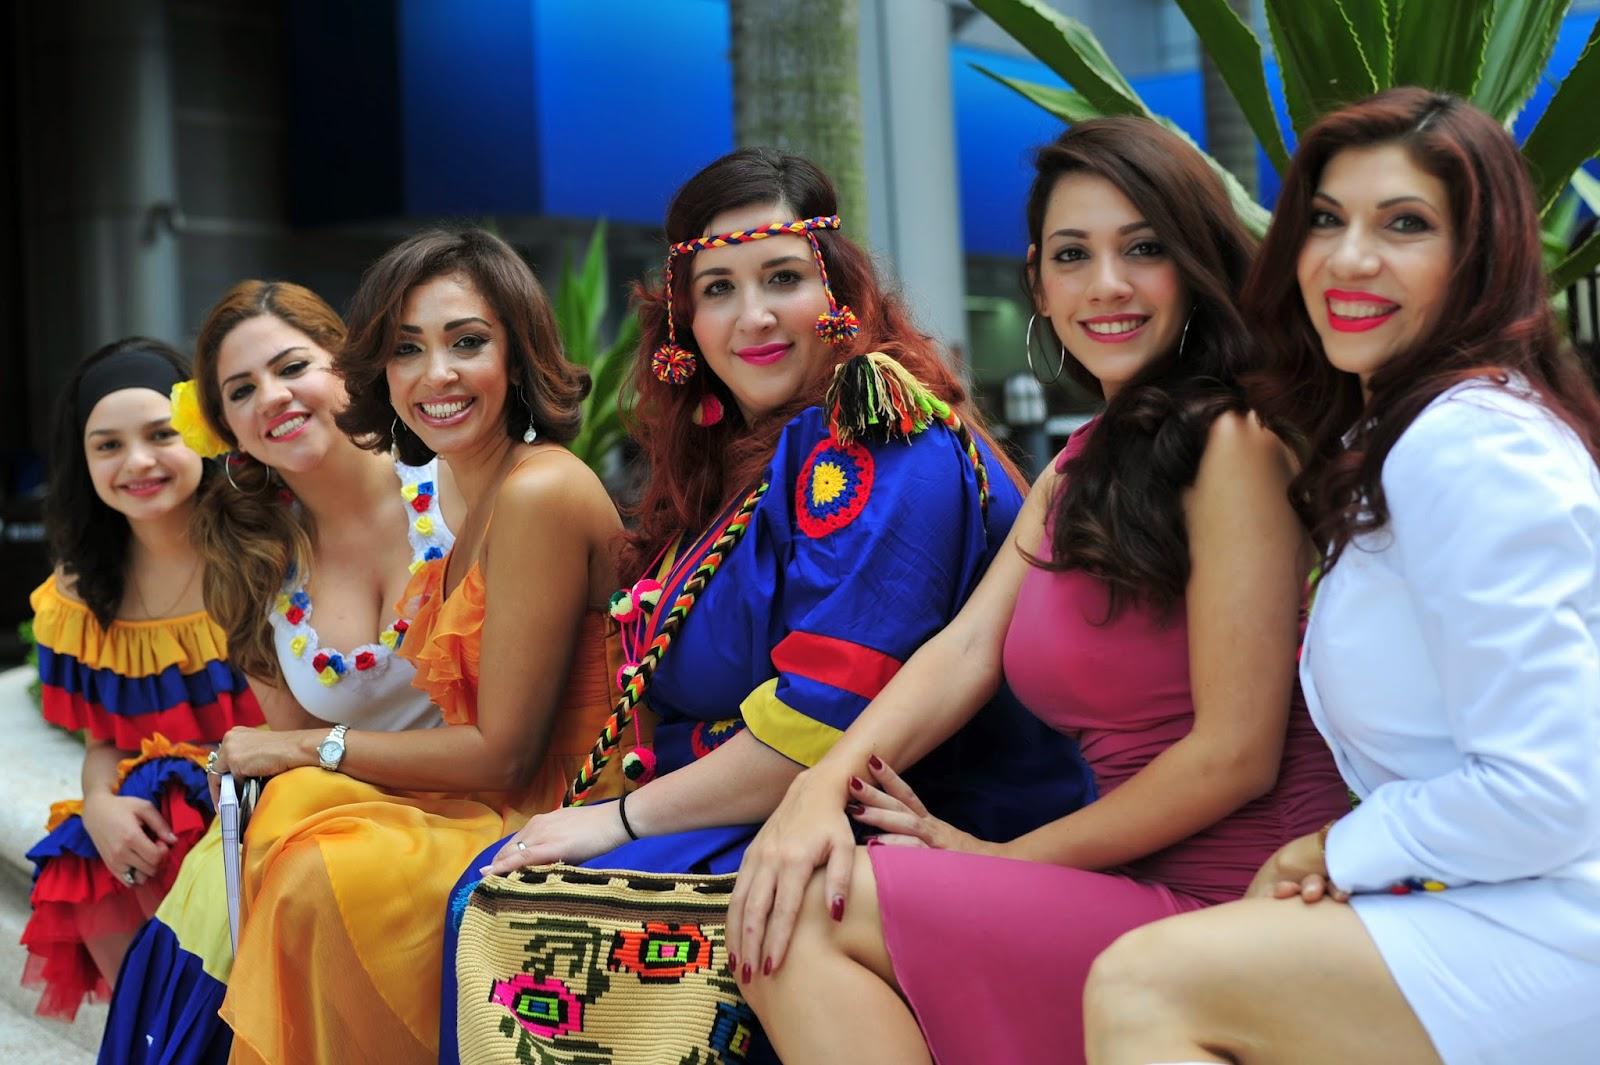 The Venezuelan Week: 9th Venezuelan Week Activities